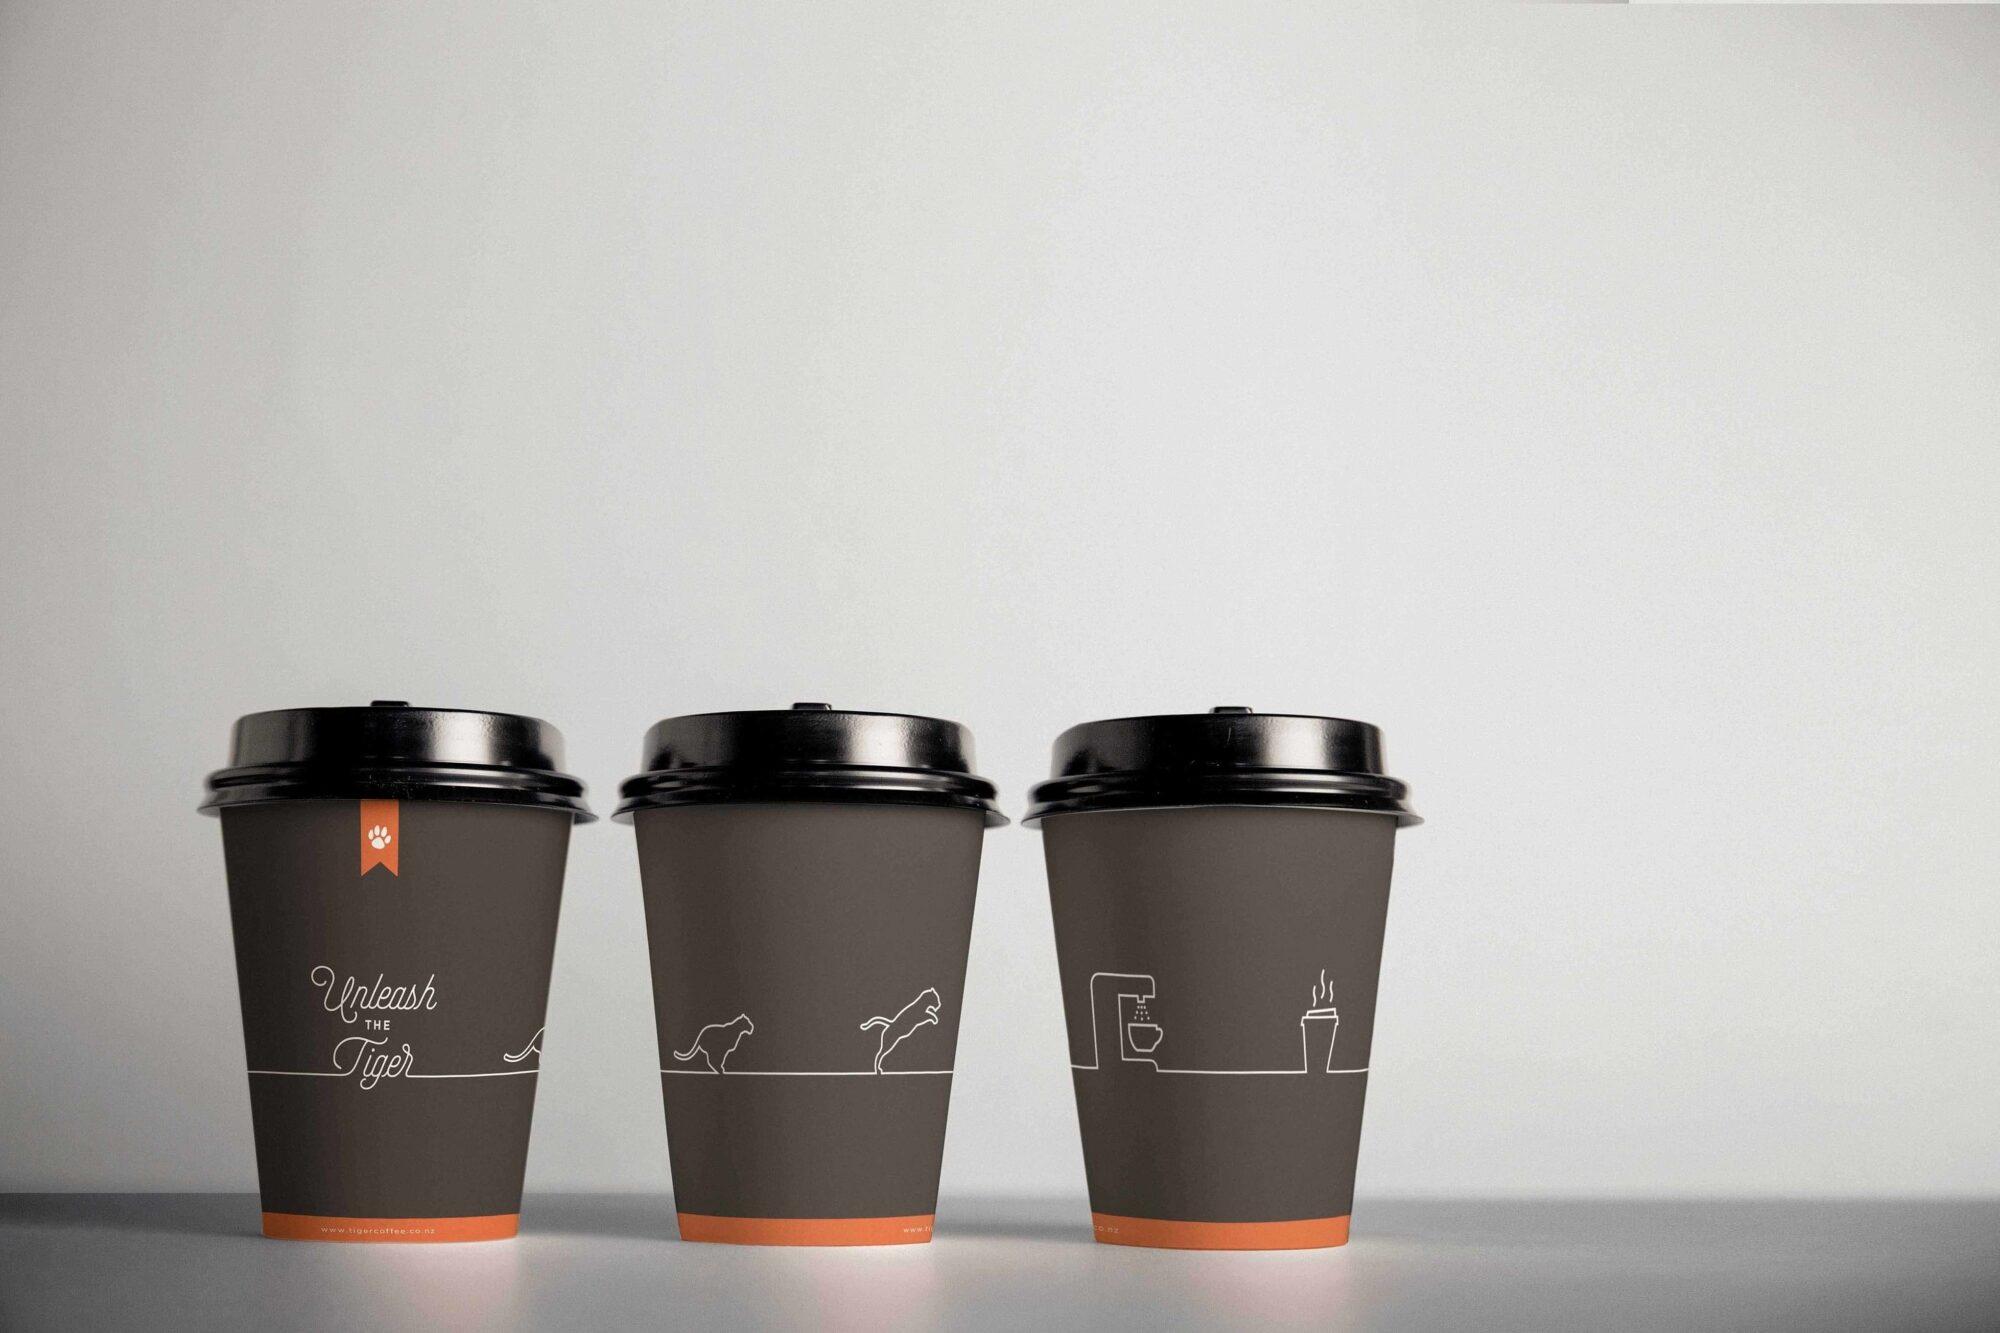 Tiger coffee 3 cups